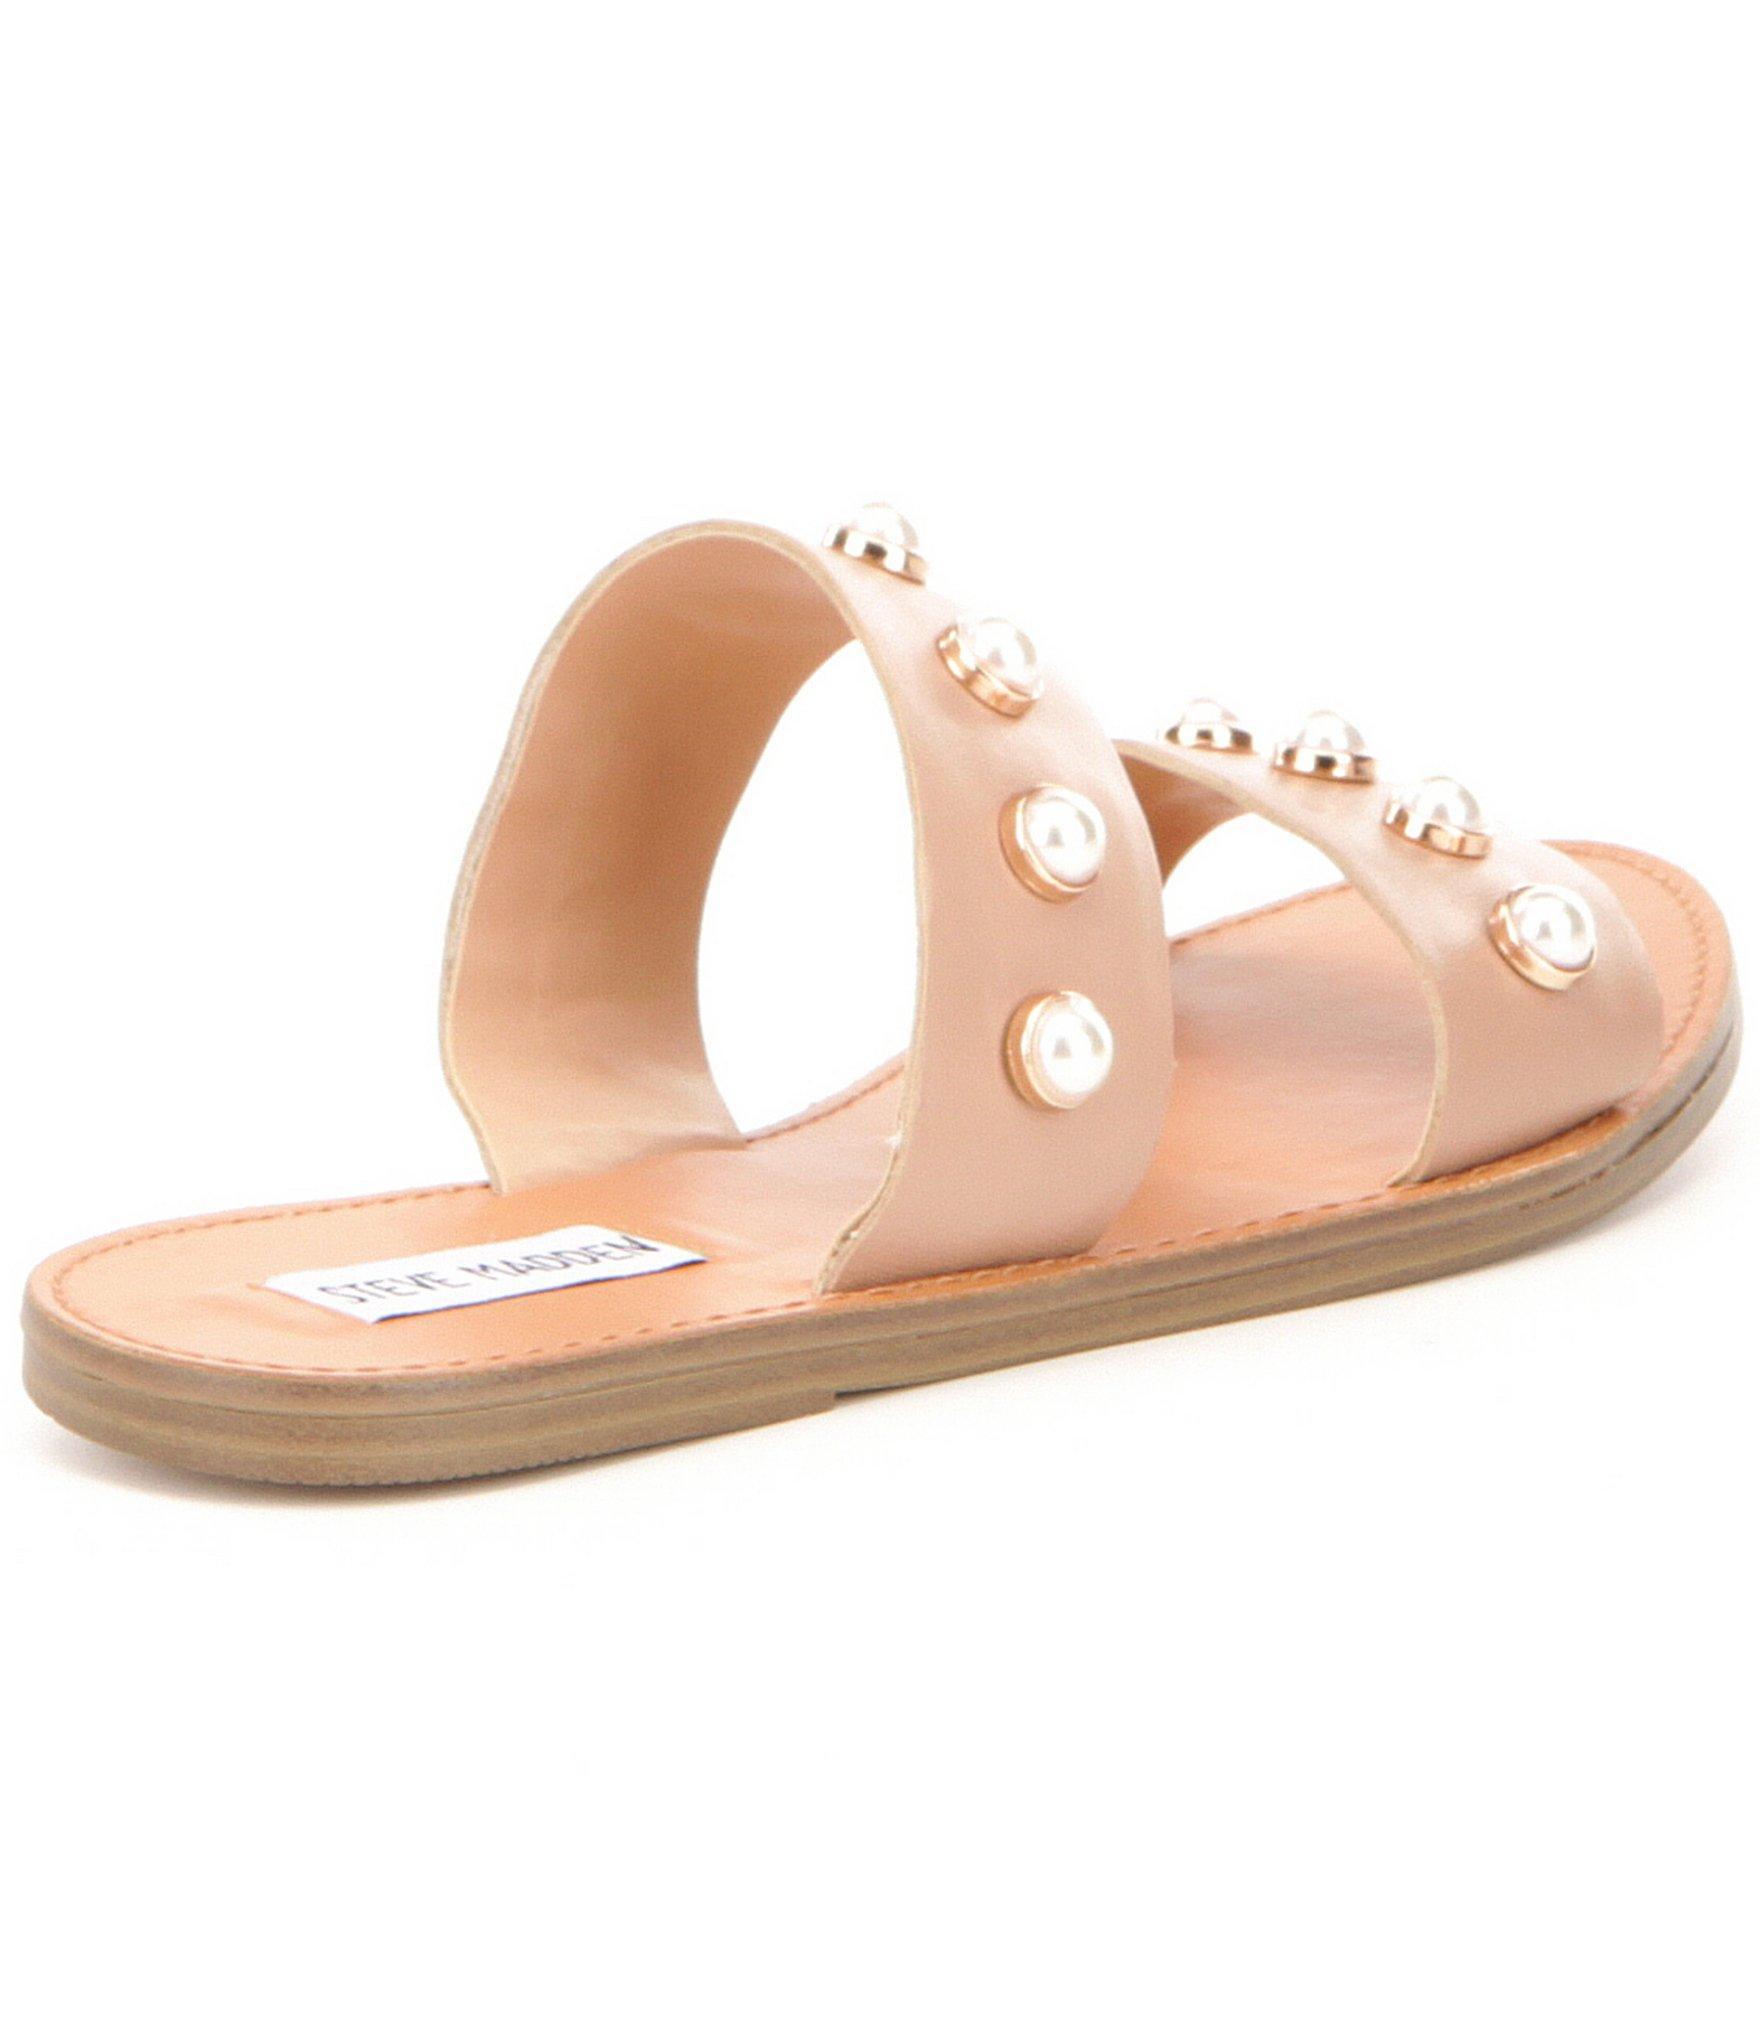 2b20be0f6470 Lyst - Steve Madden Jole Faux-pearl Slide-on Sandals